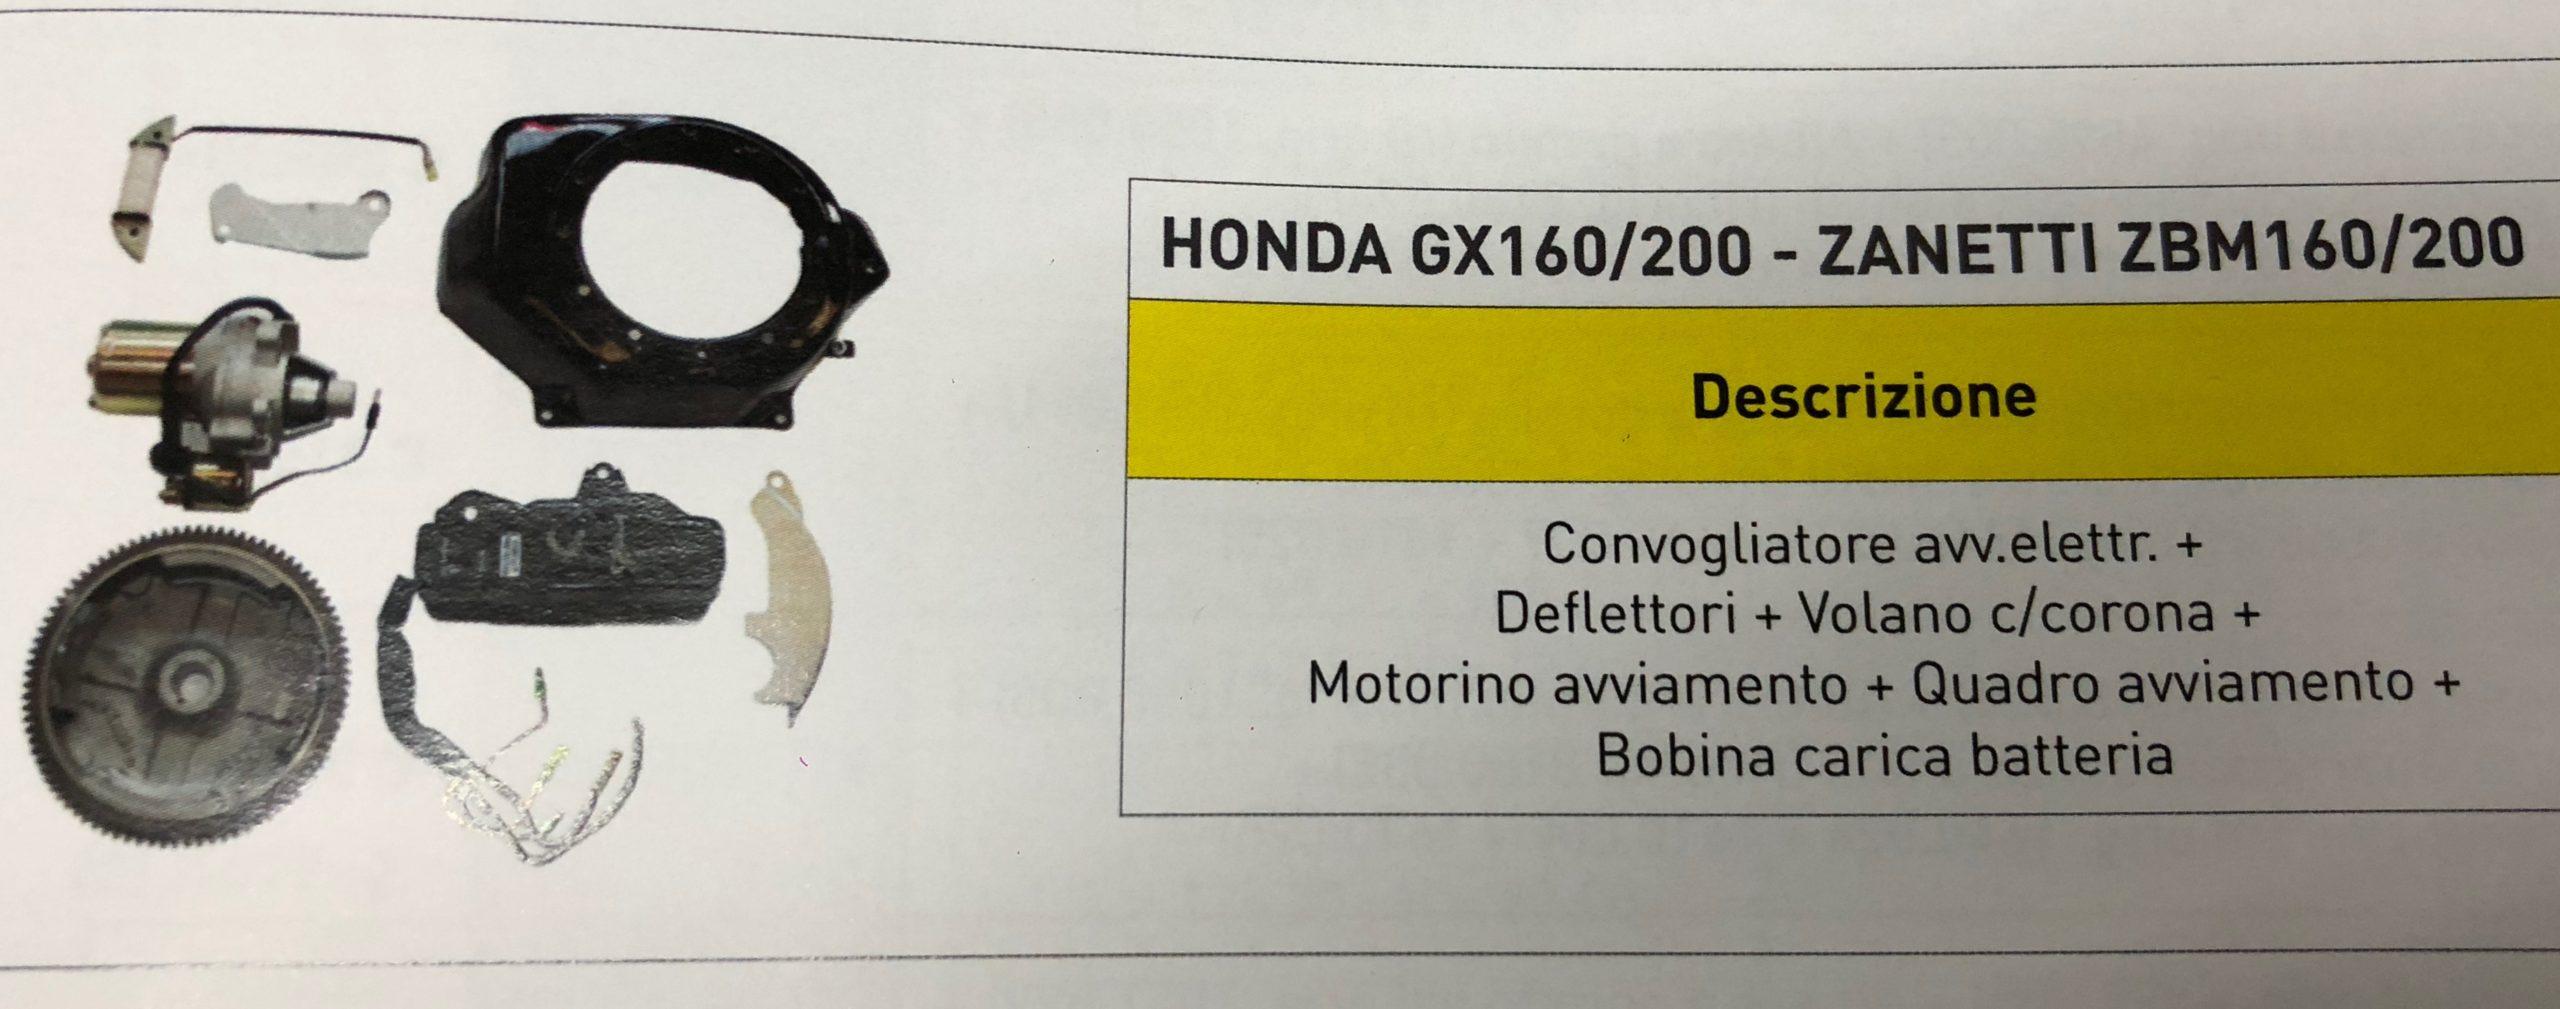 KIT AVVIAMENTO MOTORE HONDA GX 160 GX200 ANCHE PER MODELLI CINESI